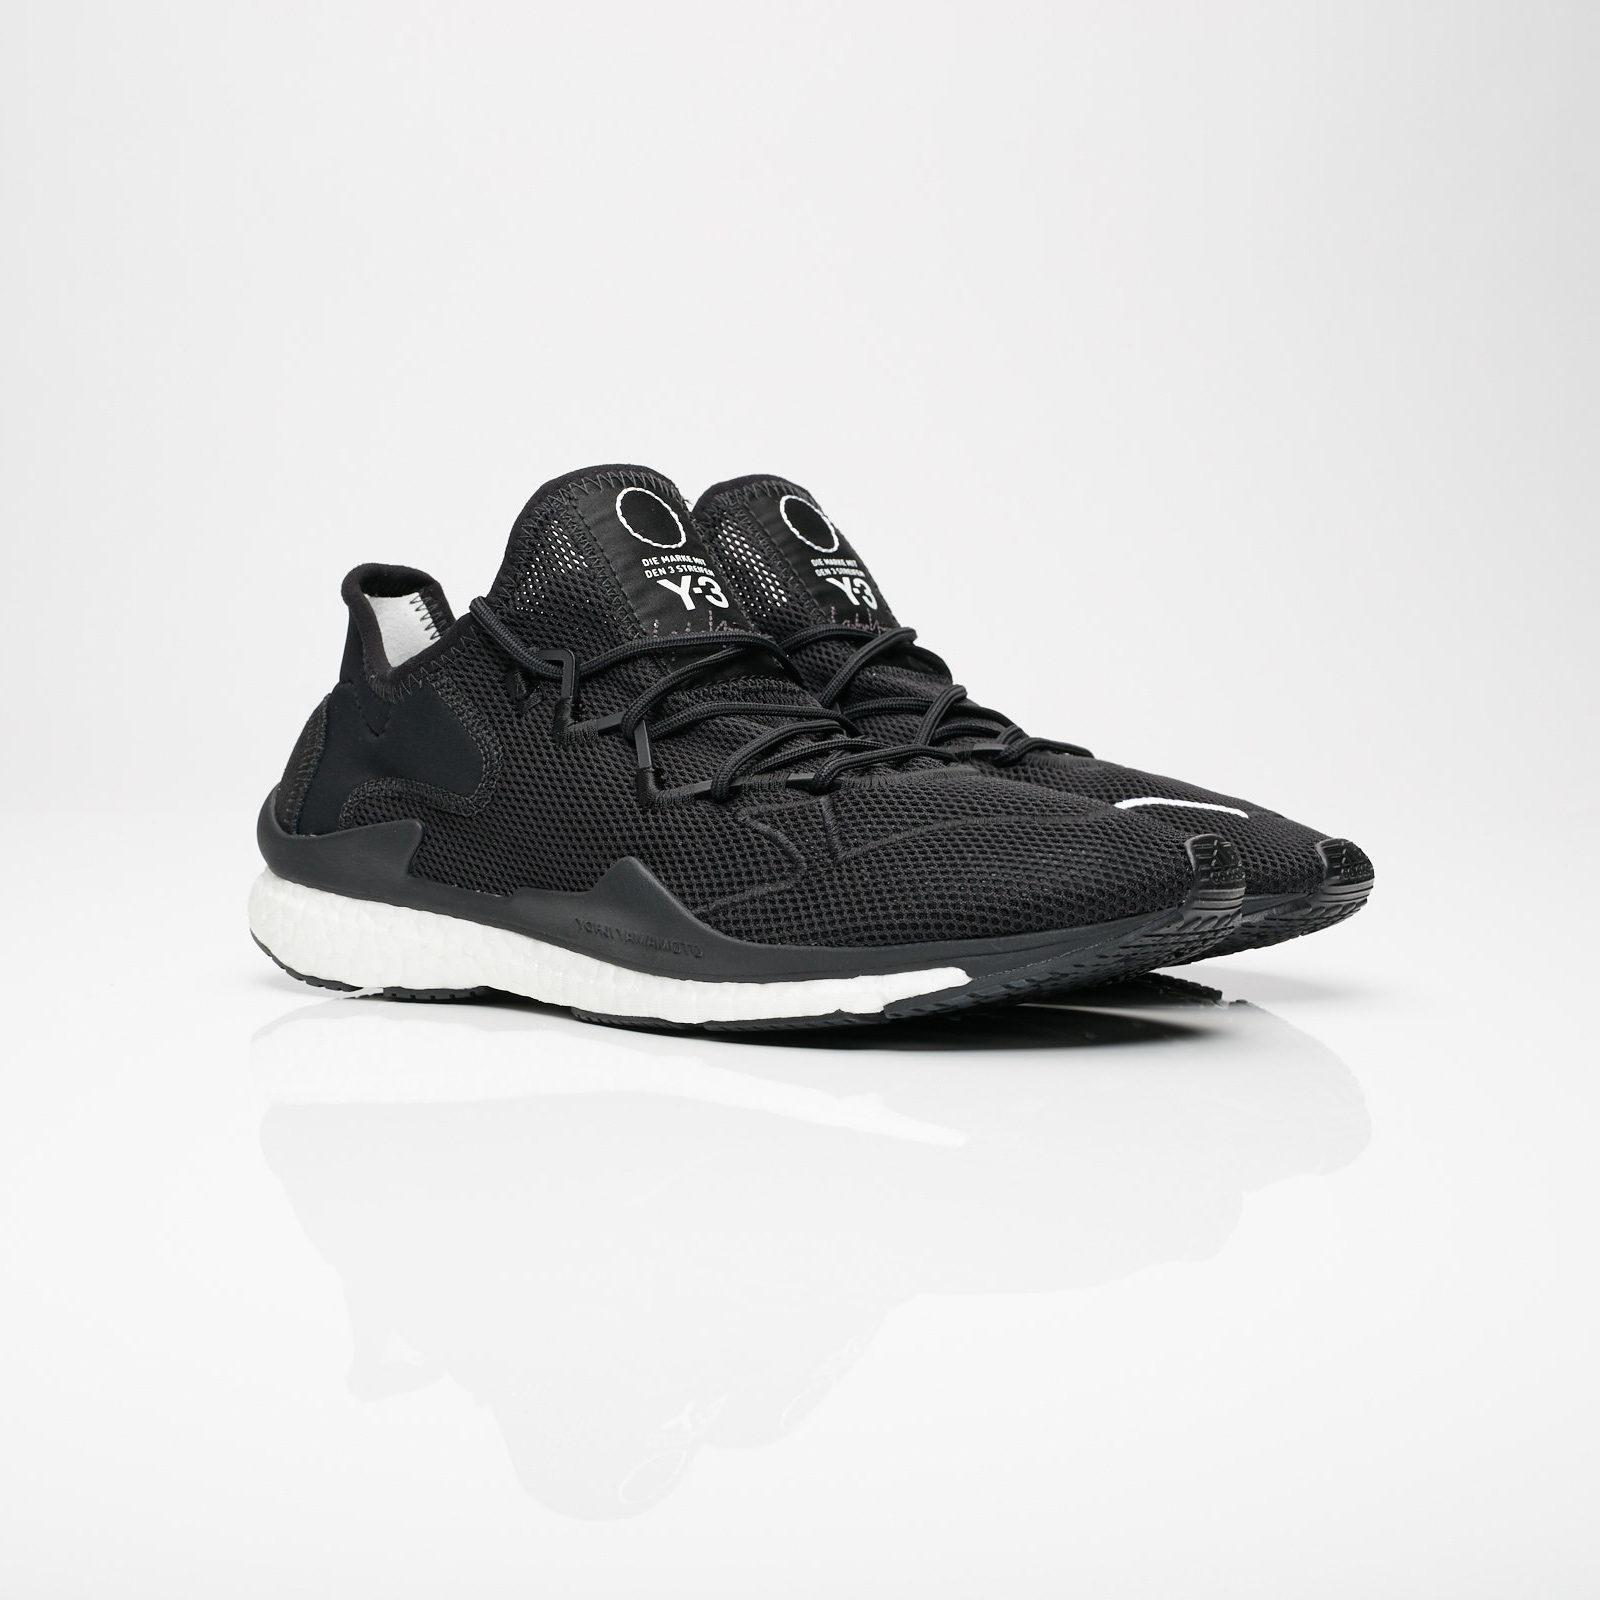 adidas Y-3 Adizero Runner - D97837 - Sneakersnstuff  b1cf0fc5d